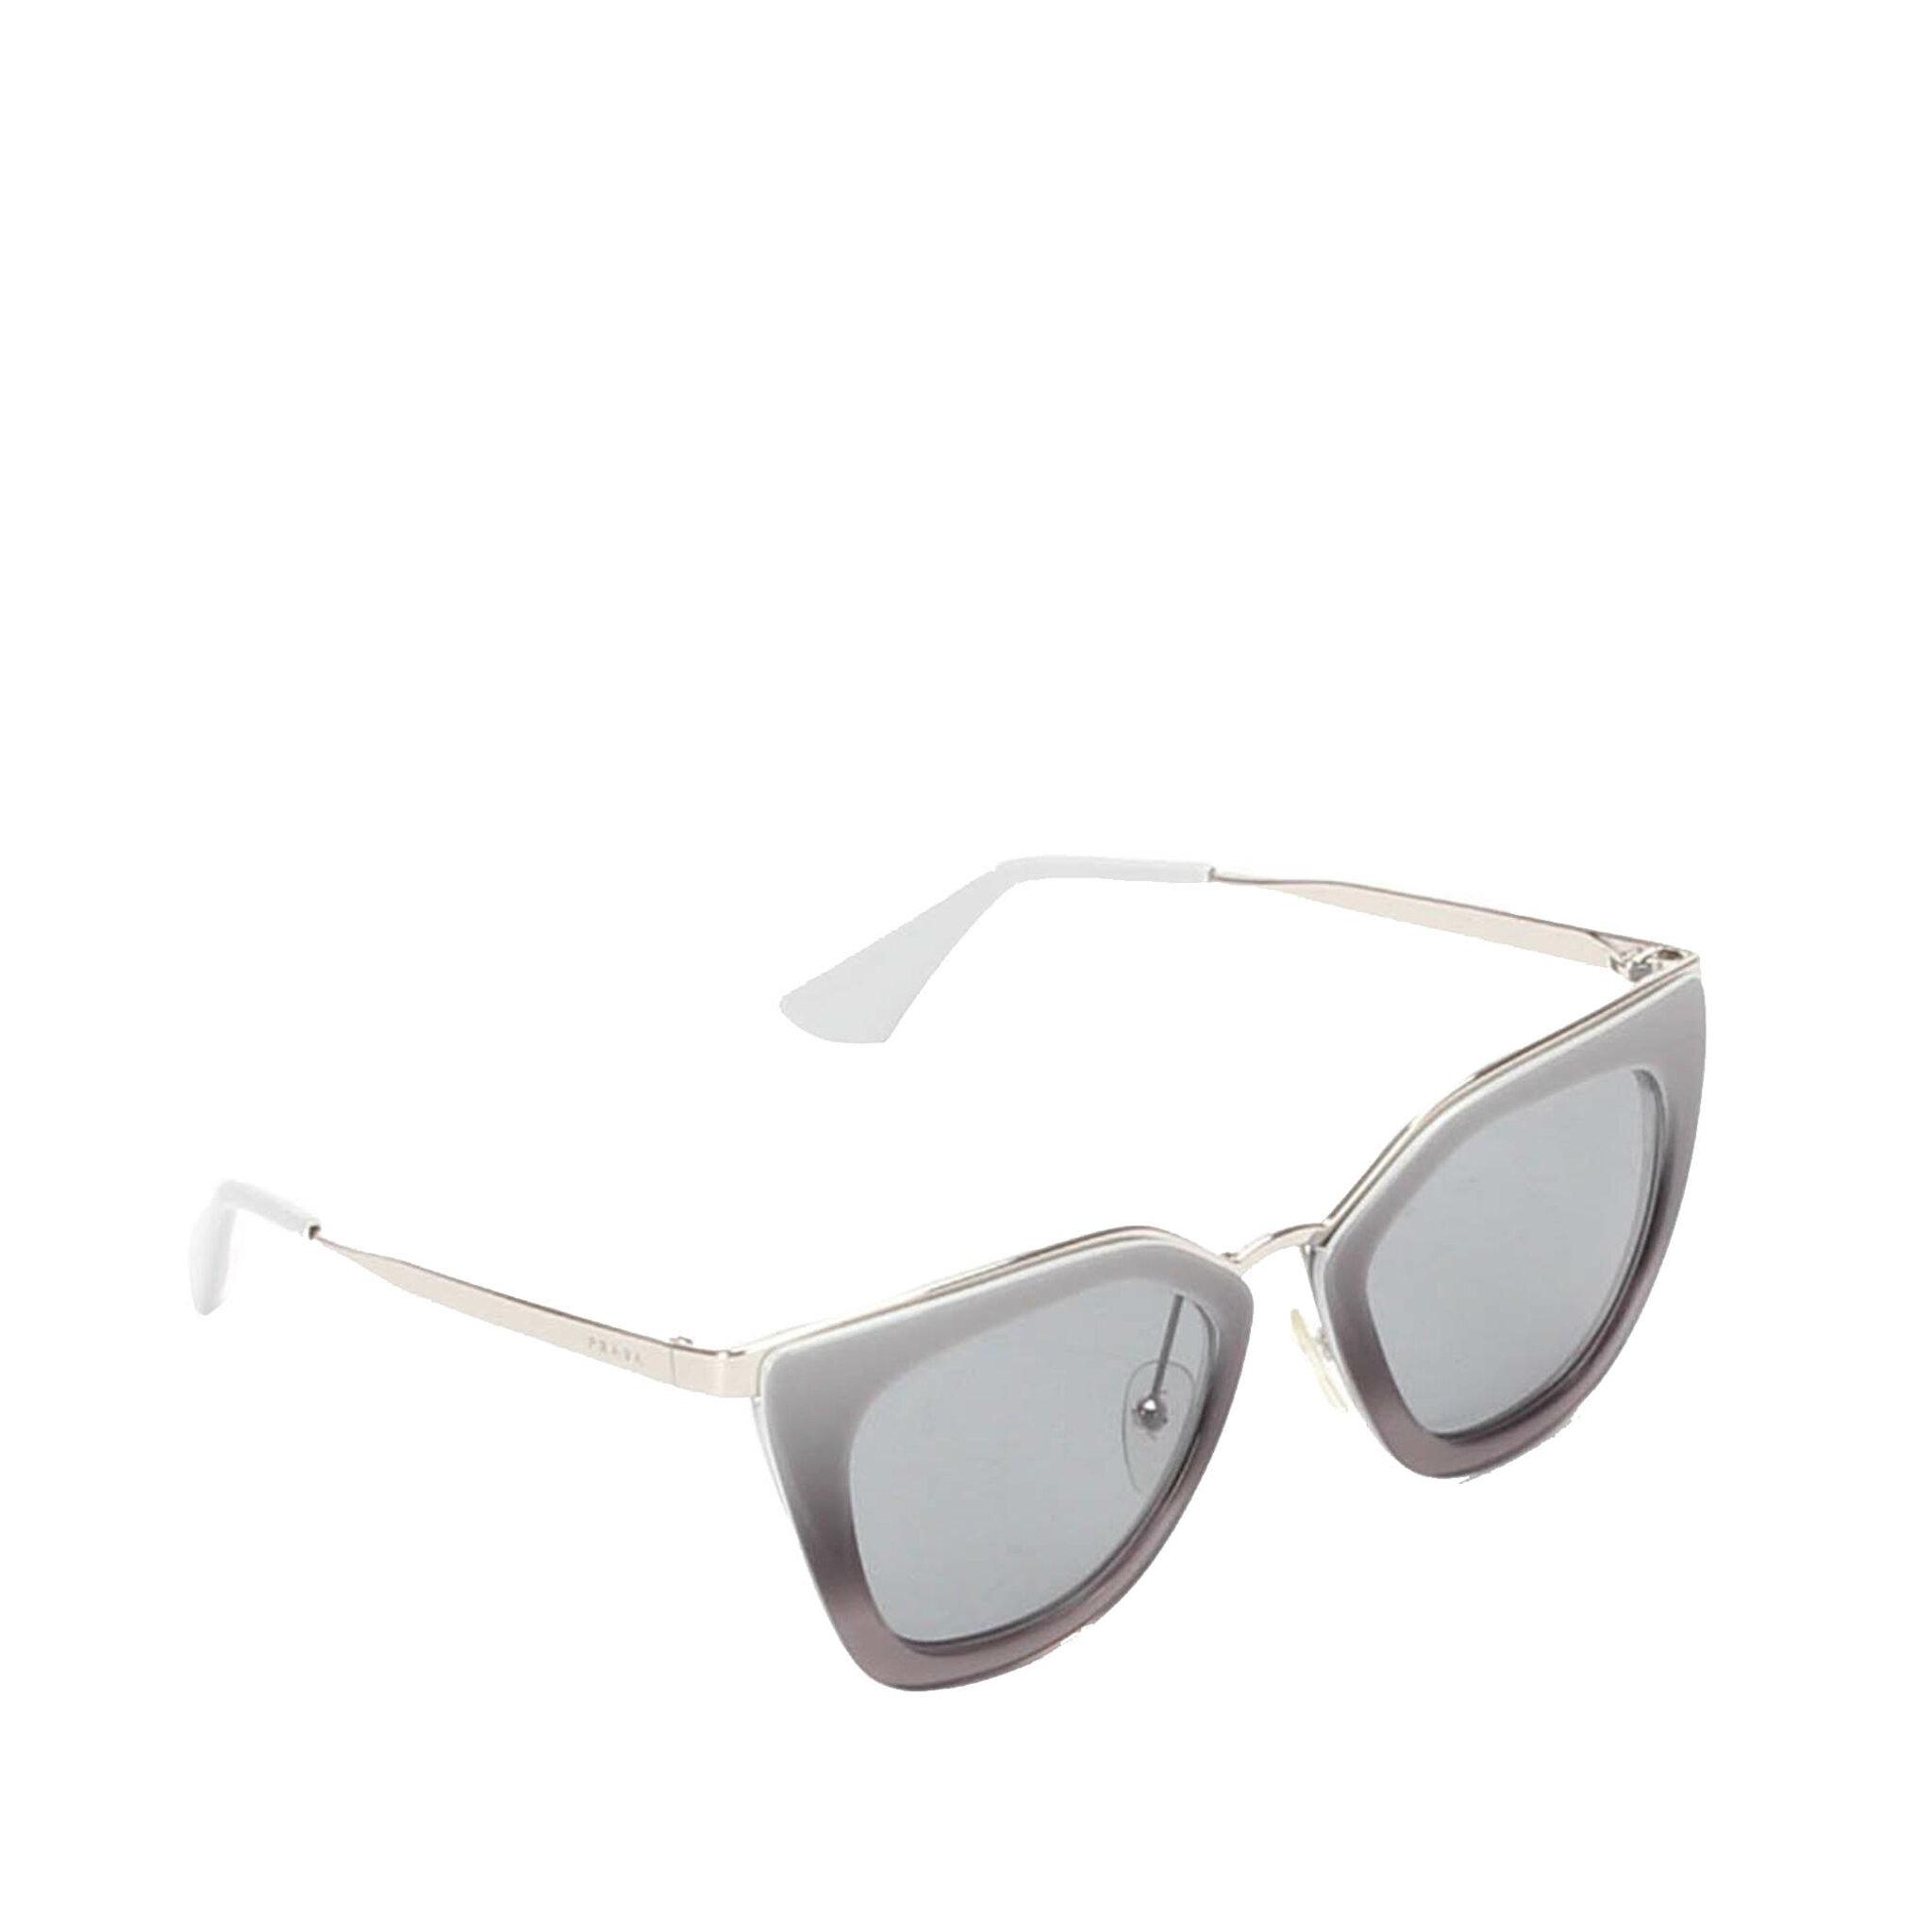 Prada Cat Eye Tinted Sunglasses, ONESIZE